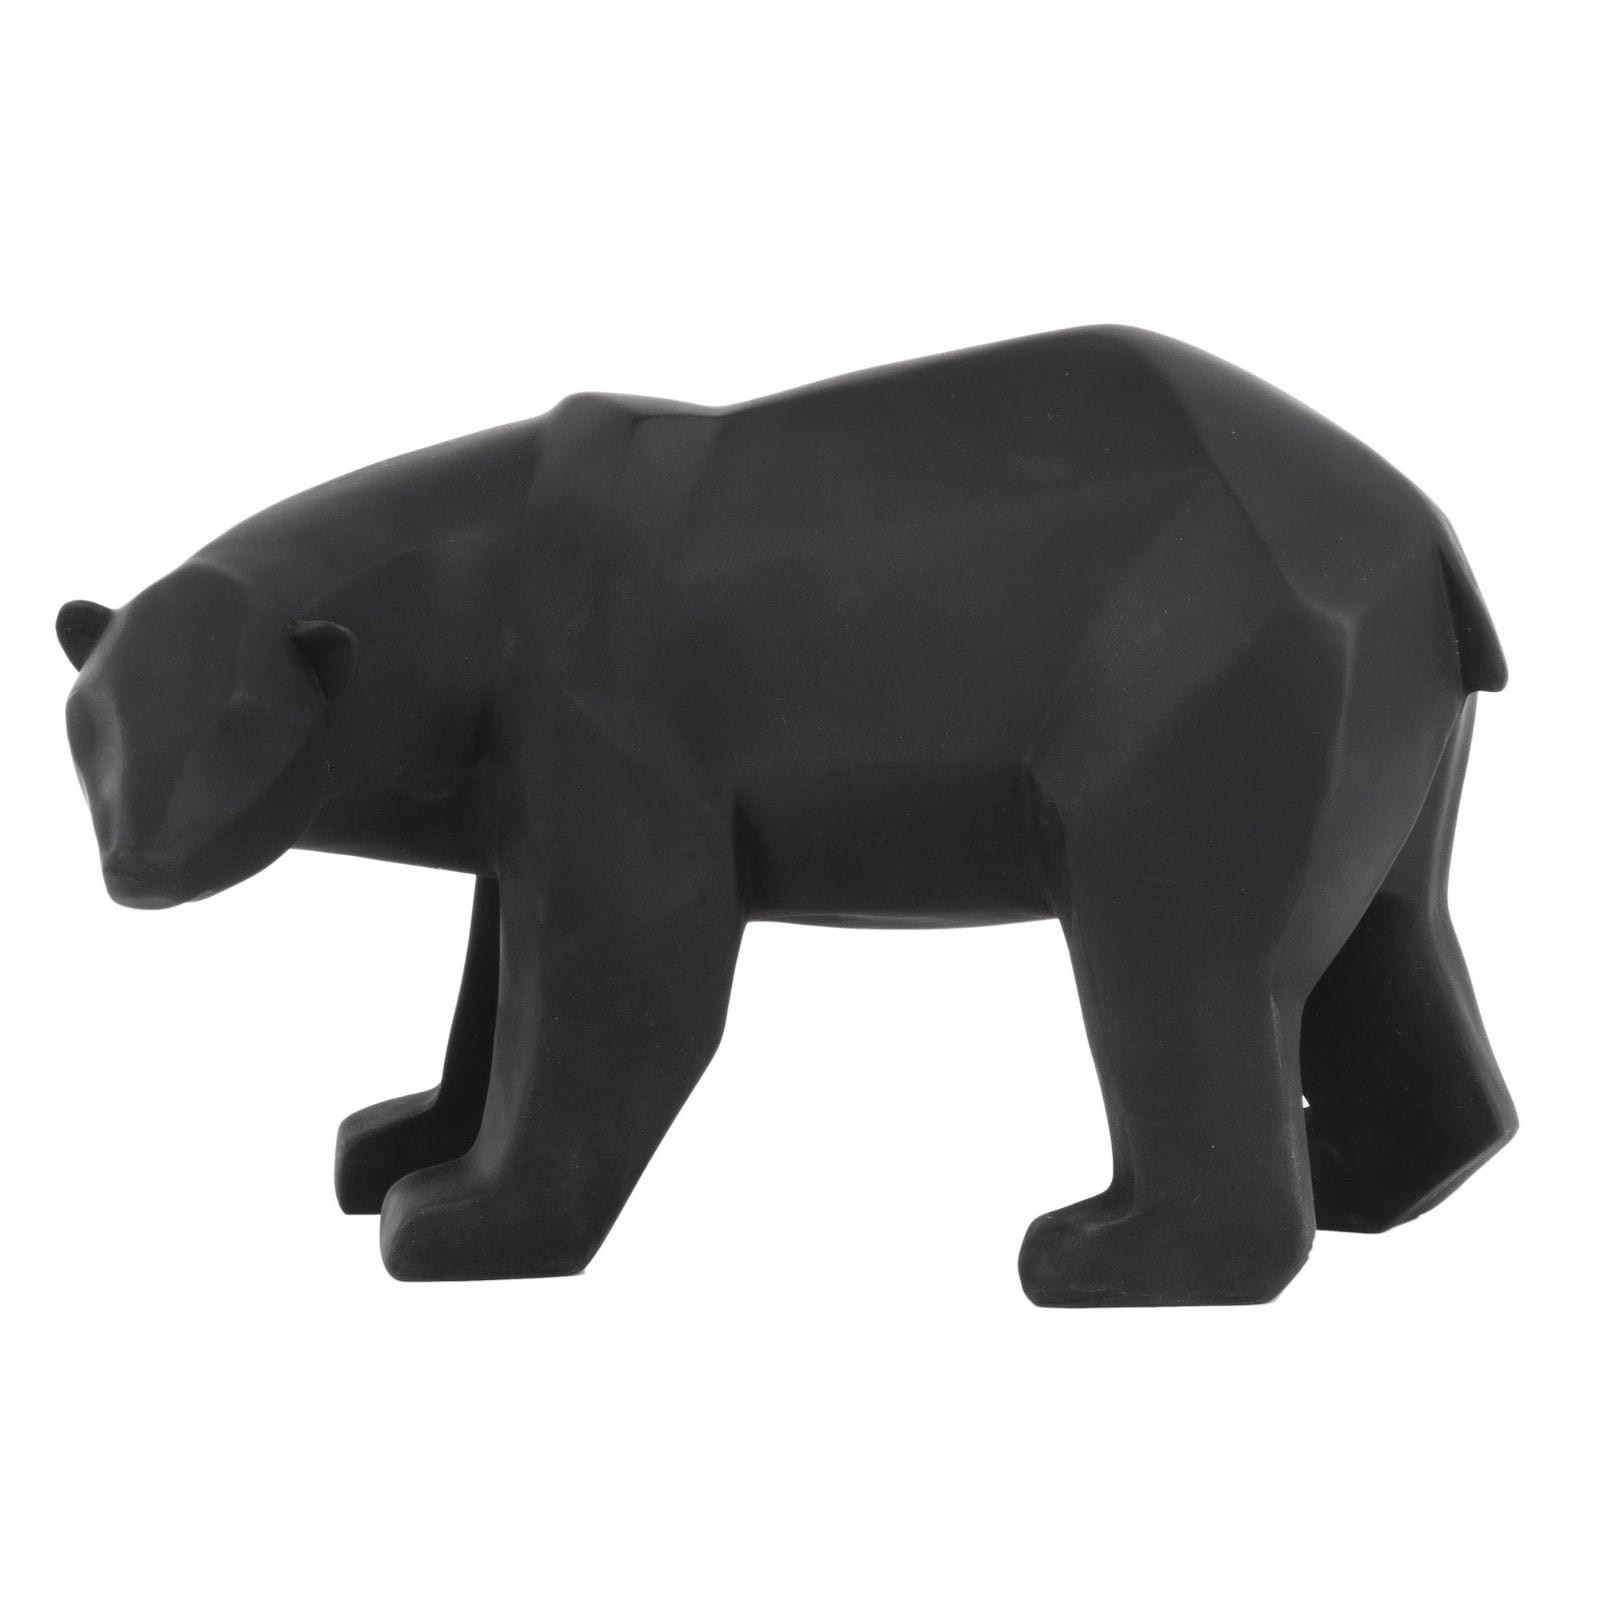 Origami Bear Statue Large (Black) - Present Time